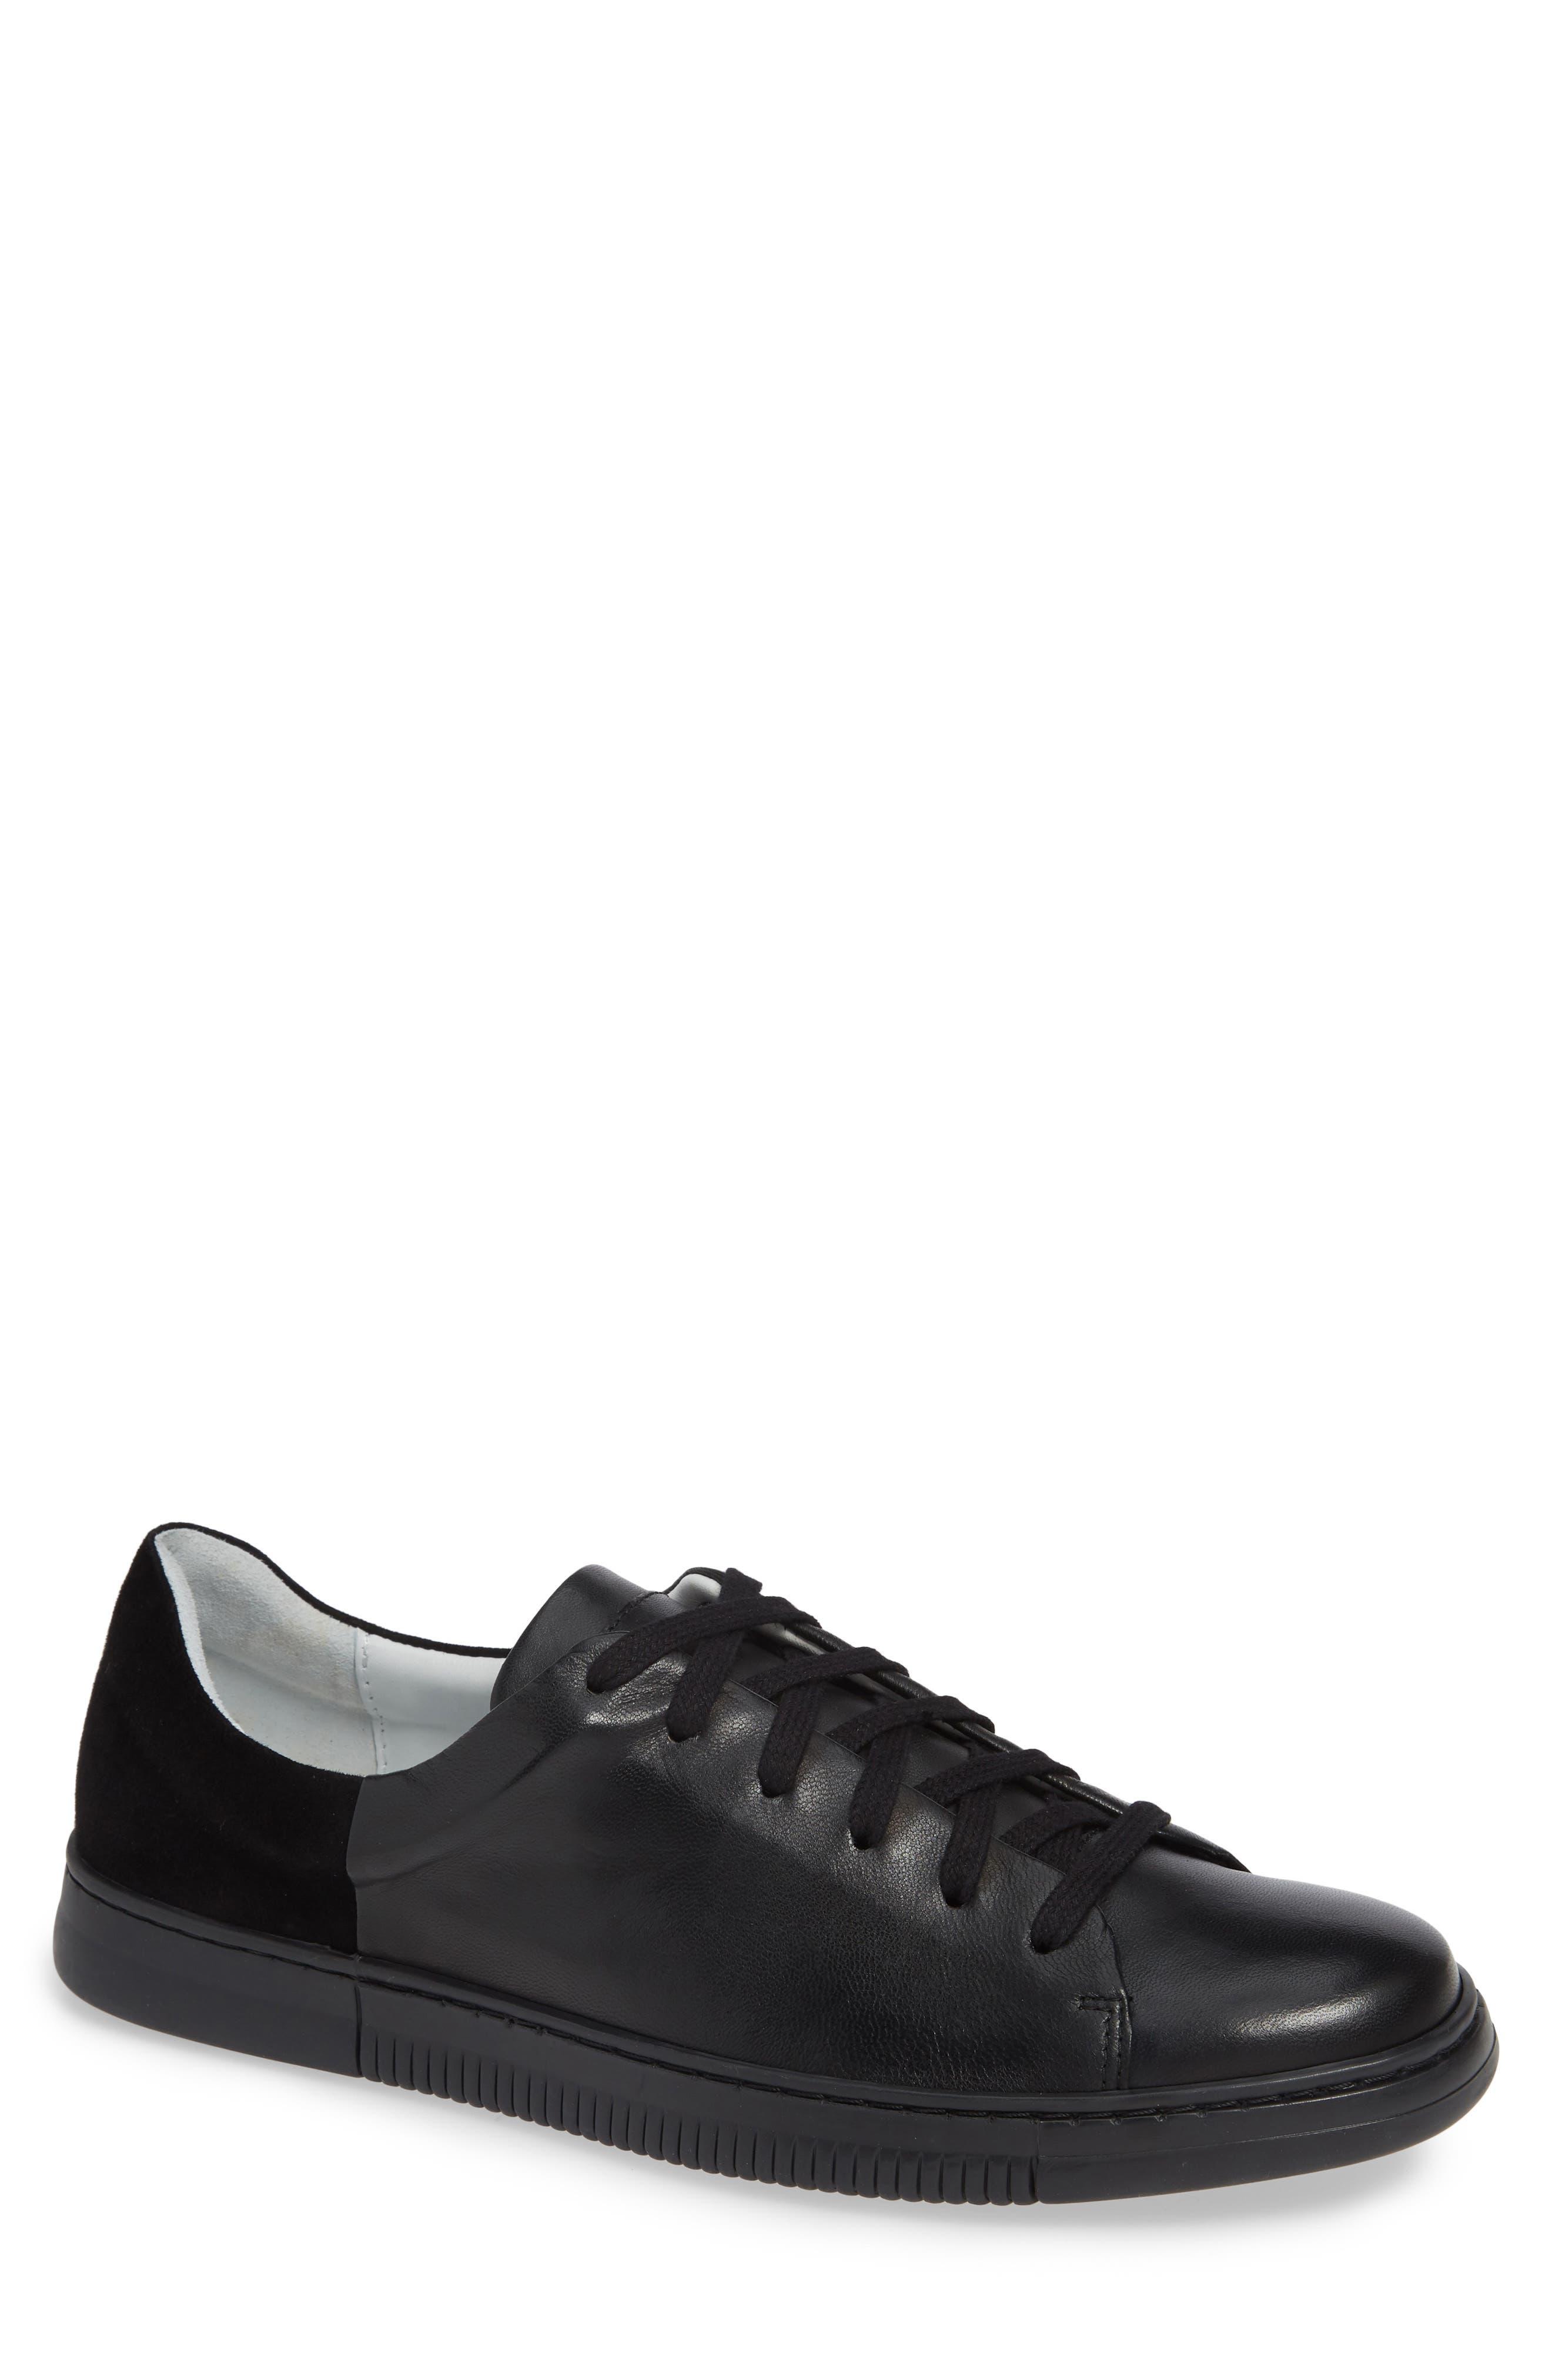 VINCE CAMUTO Jito Sneaker, Main, color, BLACK LEATHER